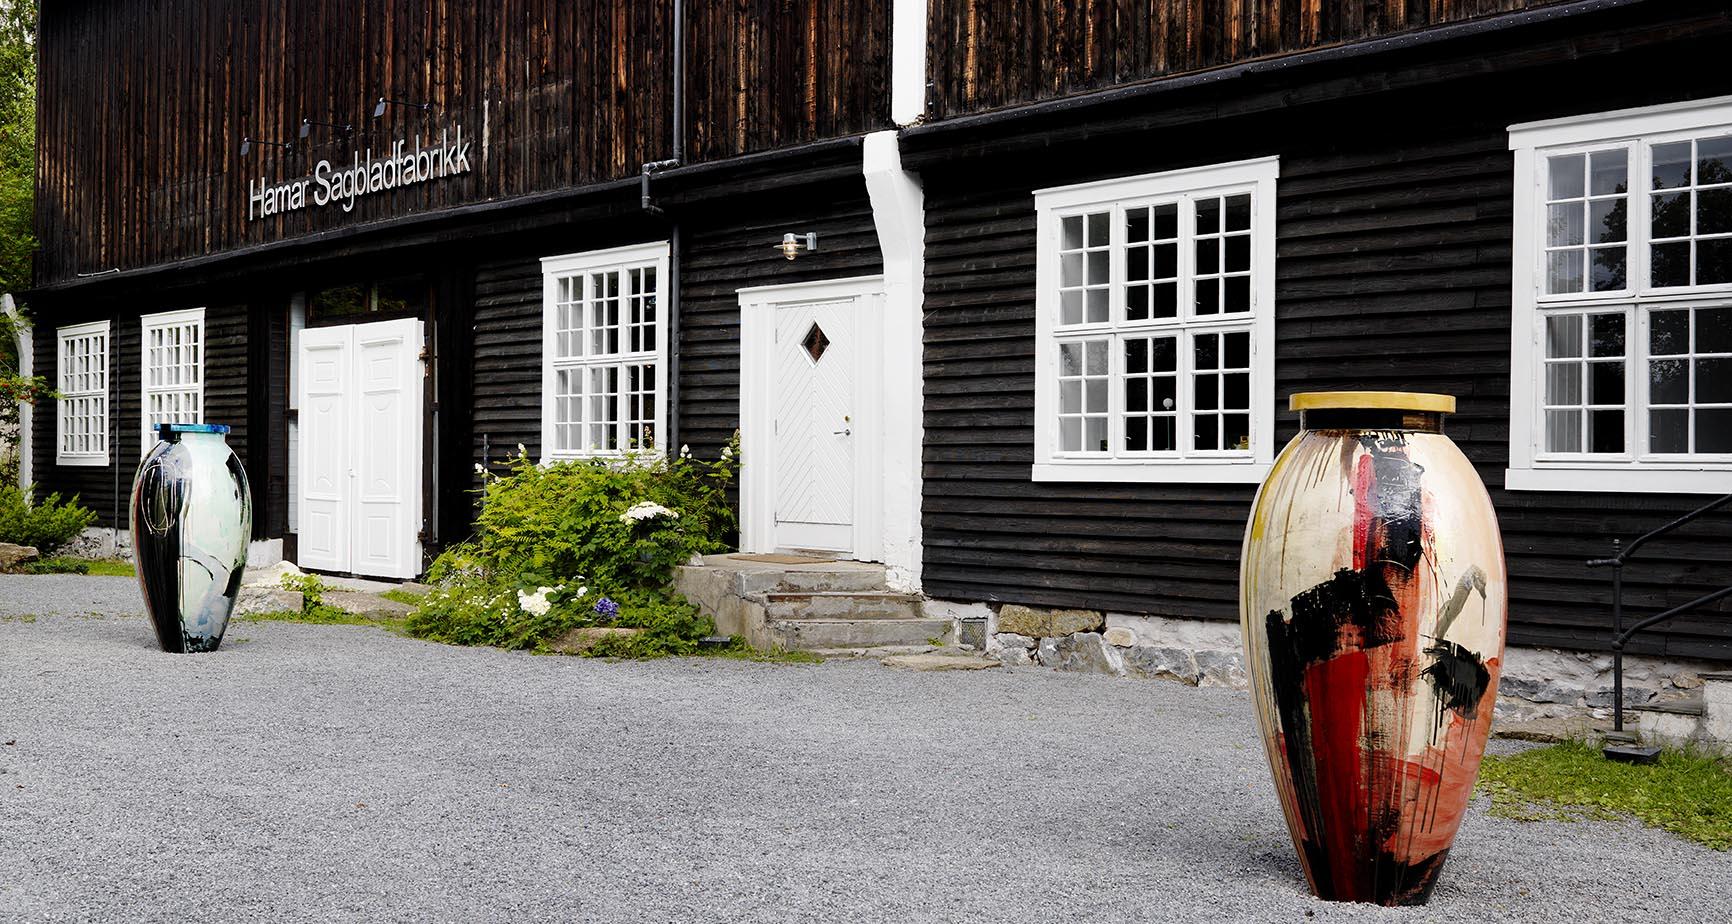 Hamar Sagbladfabrikk Kjell Nupen